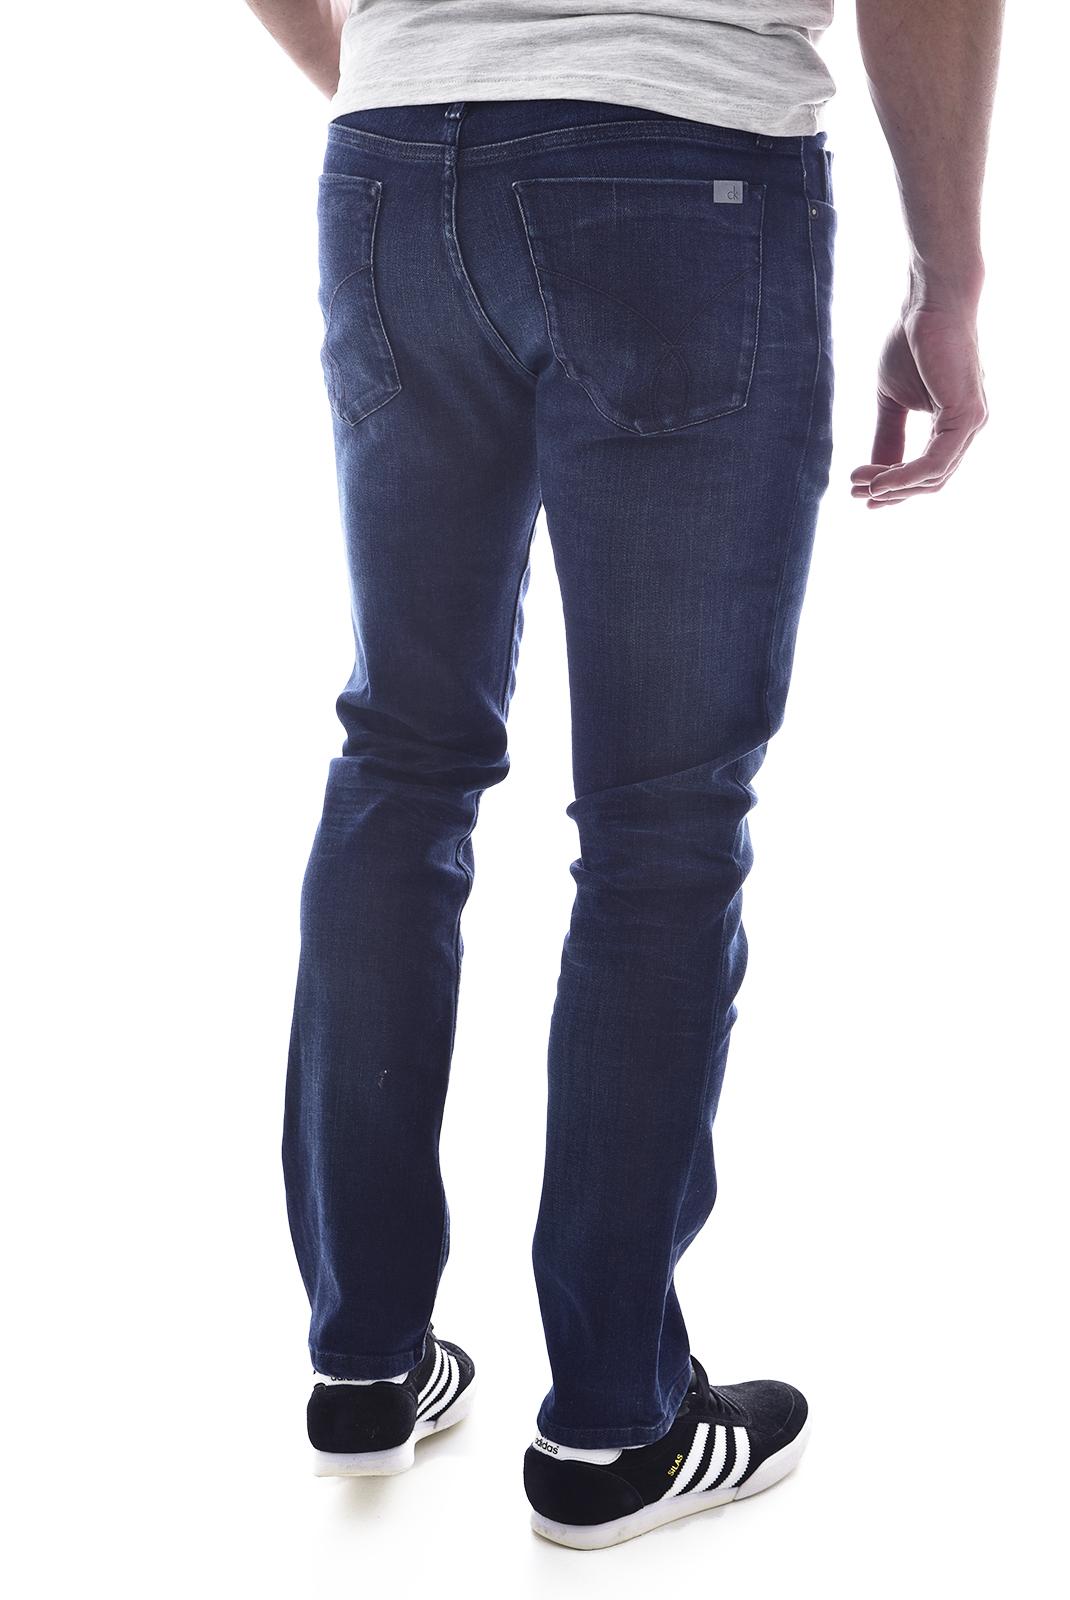 Jeans  Calvin klein J3IJ301696062 62